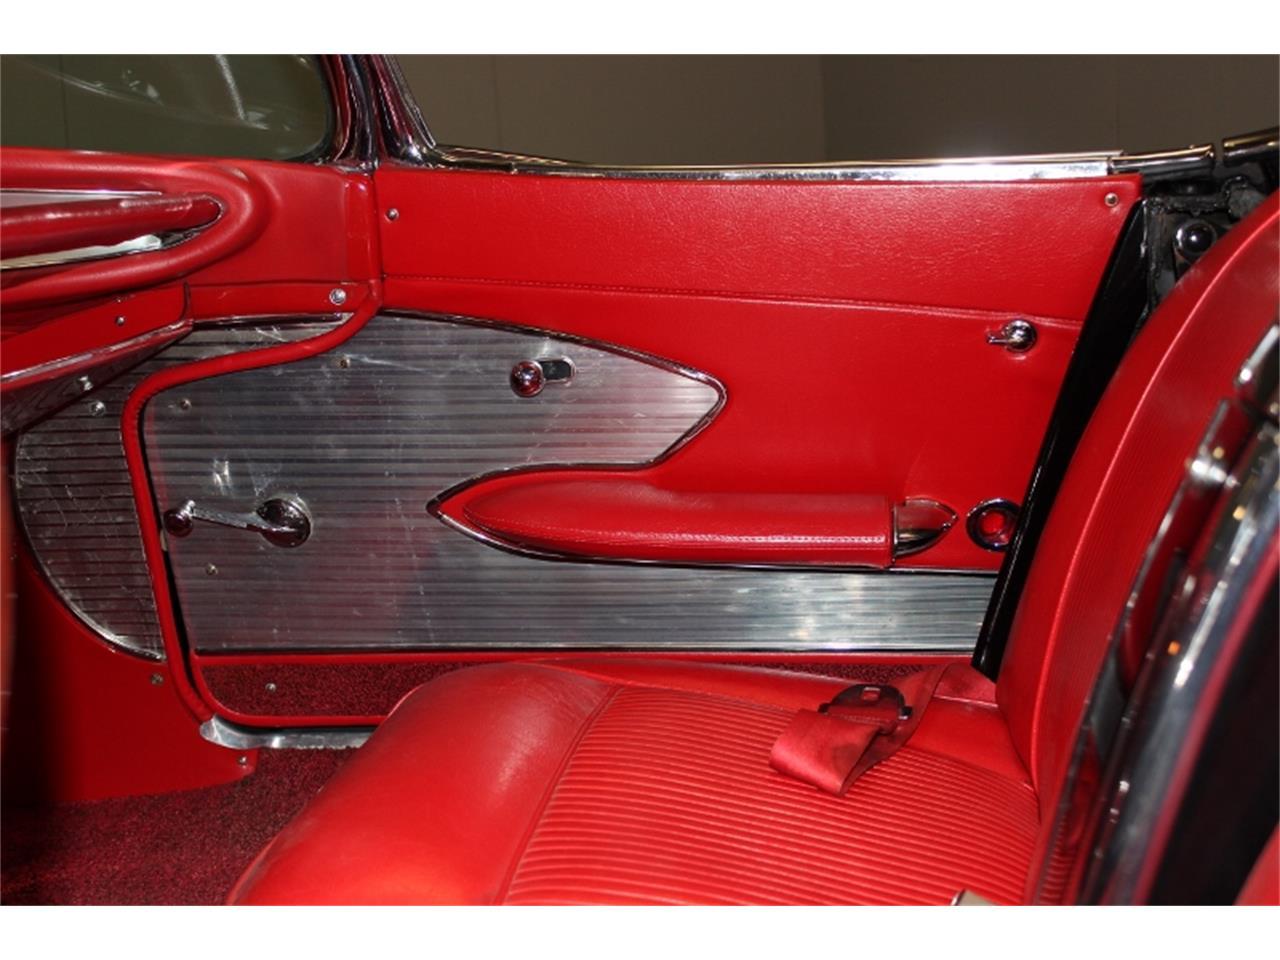 Large Picture of Classic 1961 Corvette located in Lillington North Carolina - KT5Z